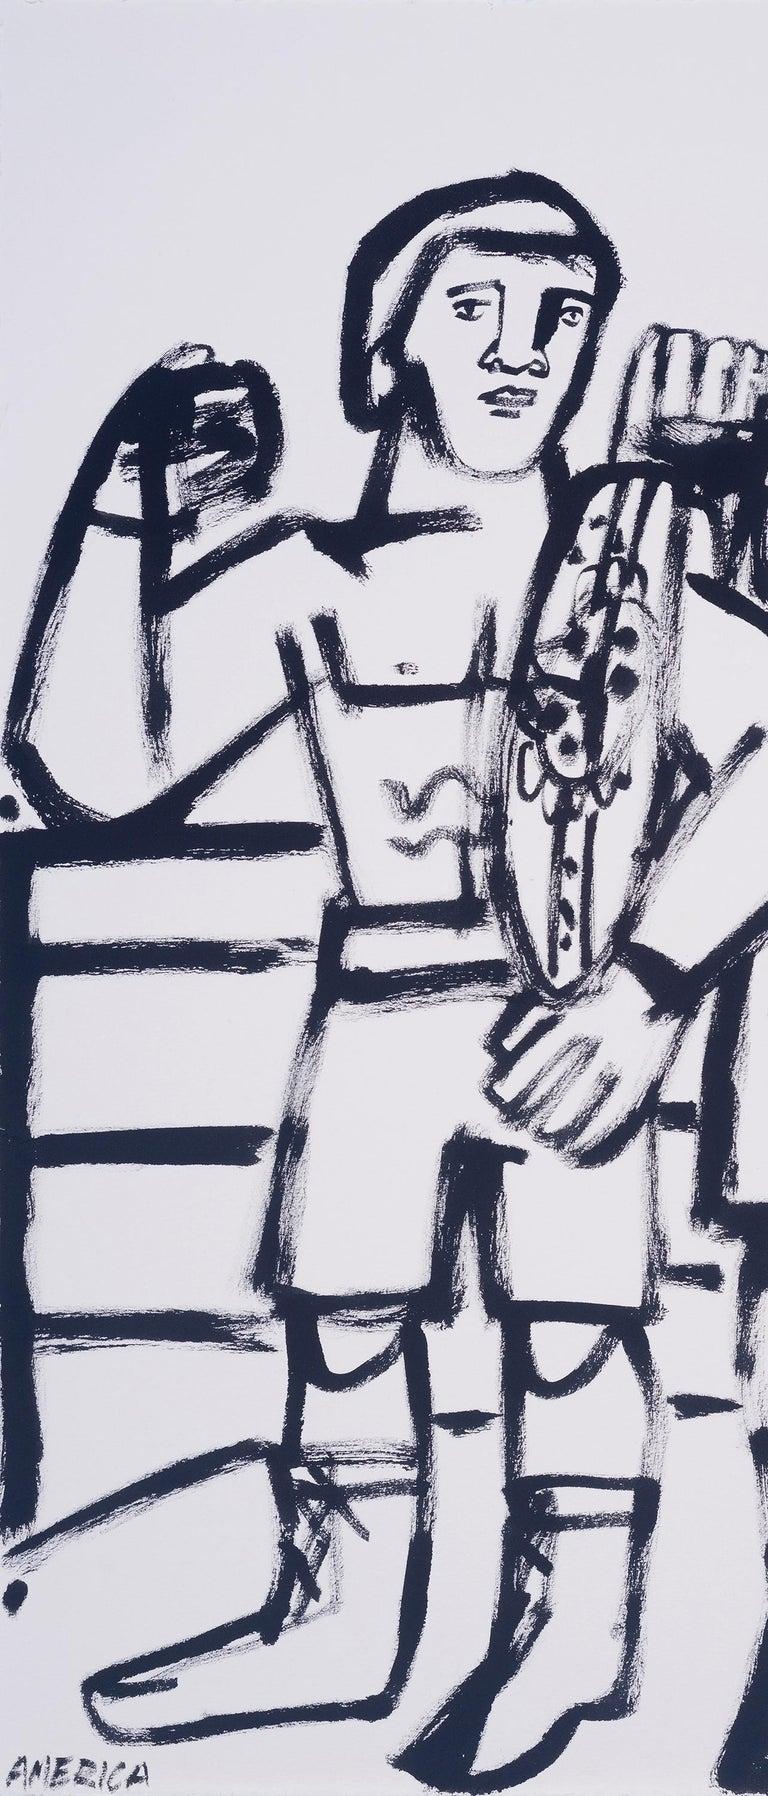 Two Champs, America Martin, black & white figurative drawing on cotton paper - Gray Figurative Art by America Martin